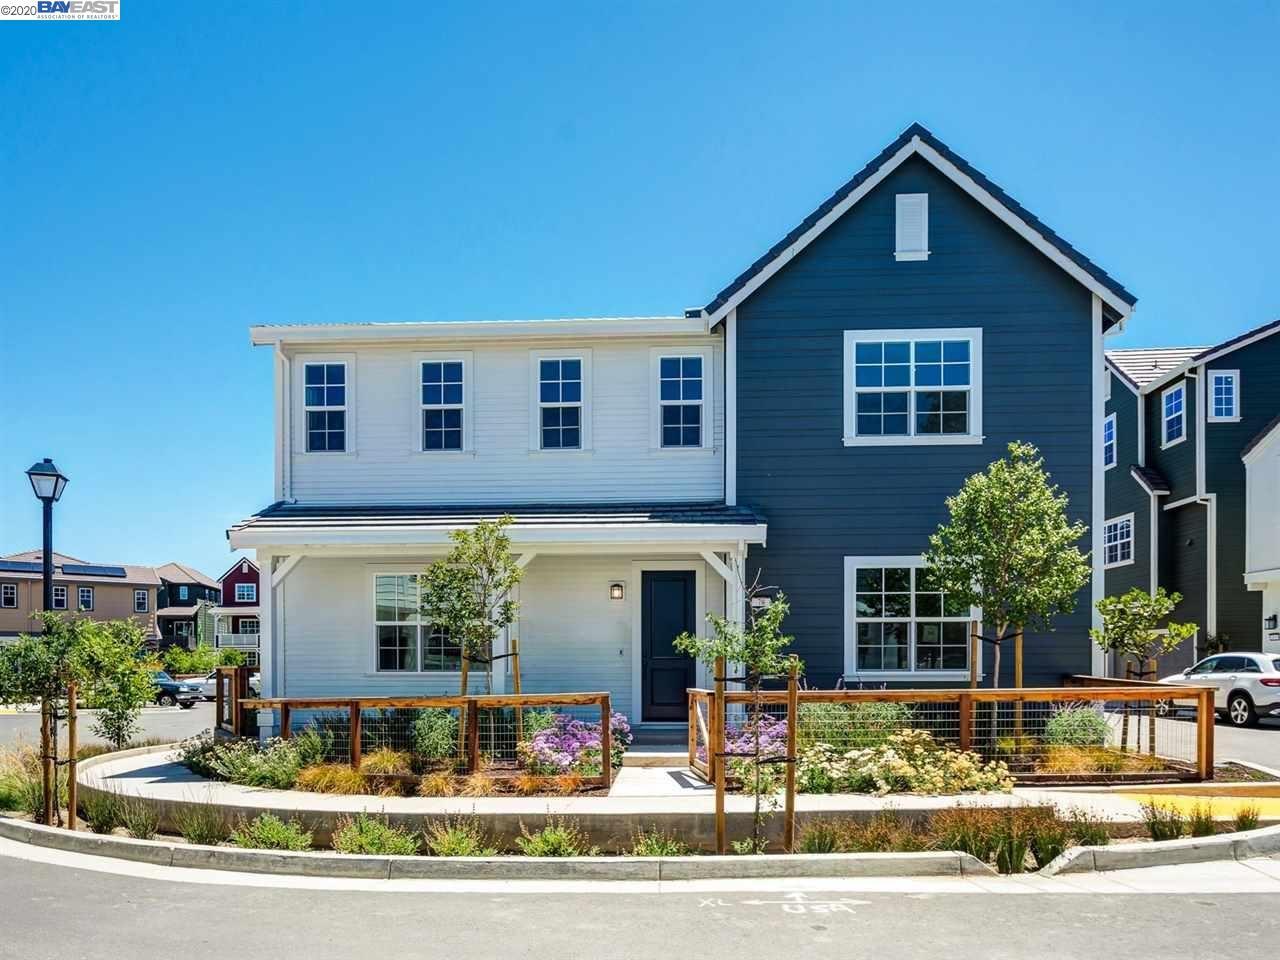 78 Sunflower Hill Way, Pleasanton, CA 94566 - MLS#: 40905505